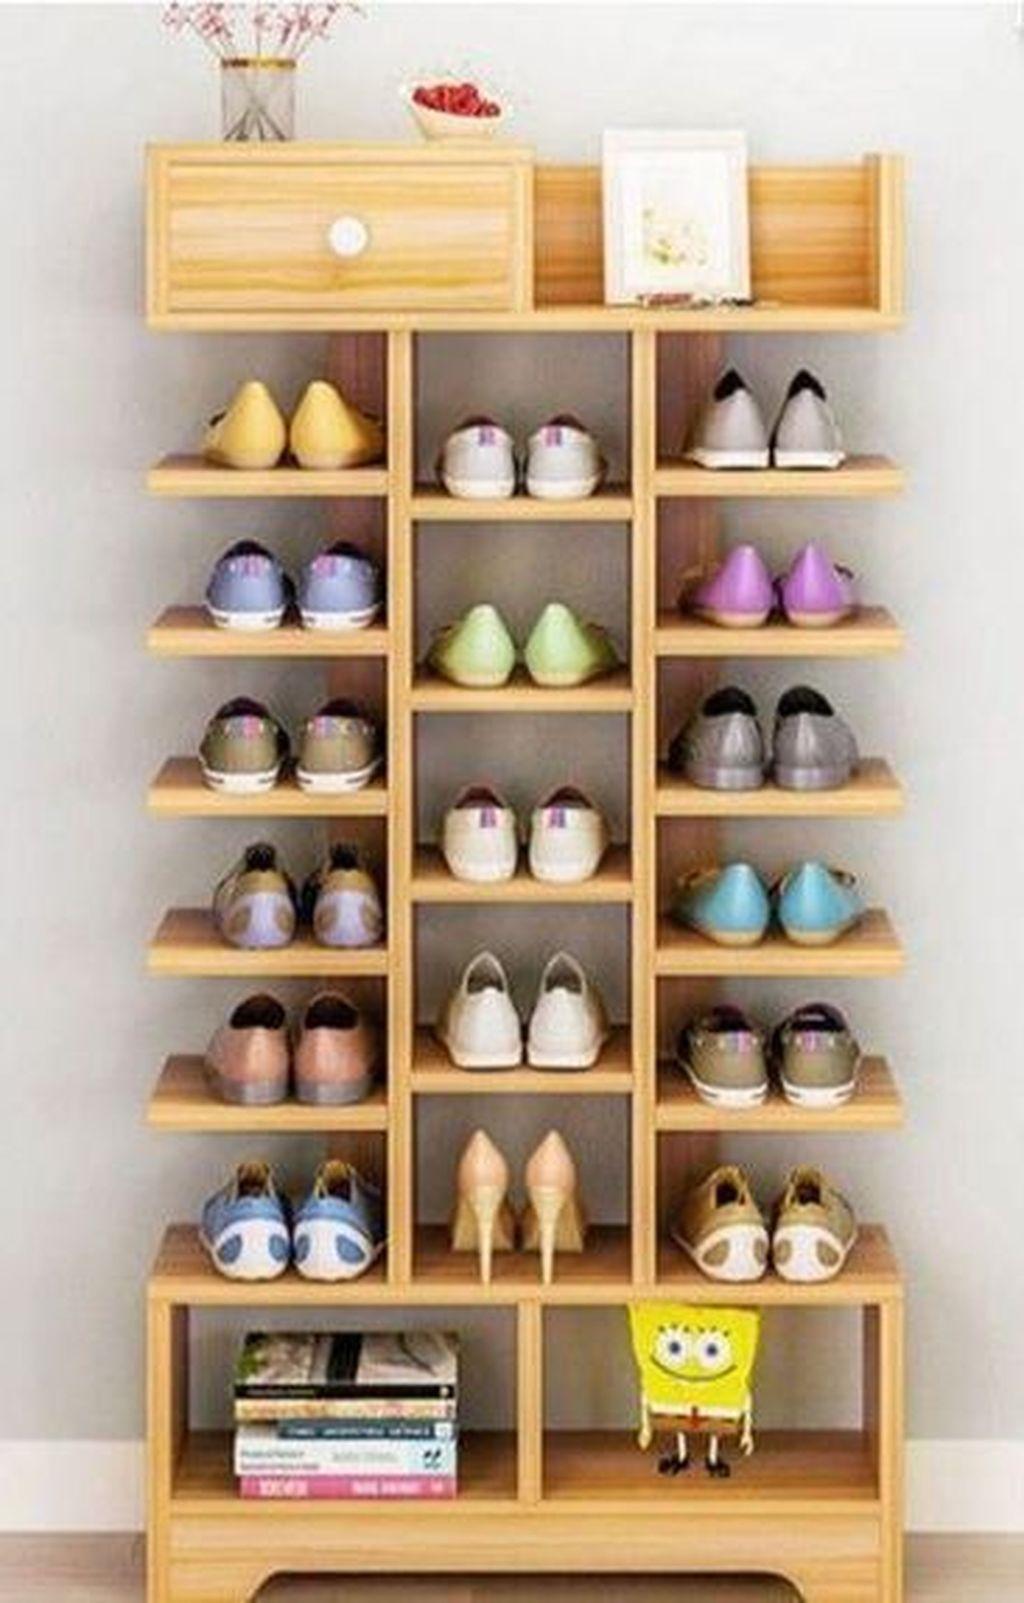 36 Delightful Diy Shoe Rack Design Ideas To Keep Your Shoes Nicely Diy Shoe Storage Shoe Storage Design Diy Furniture